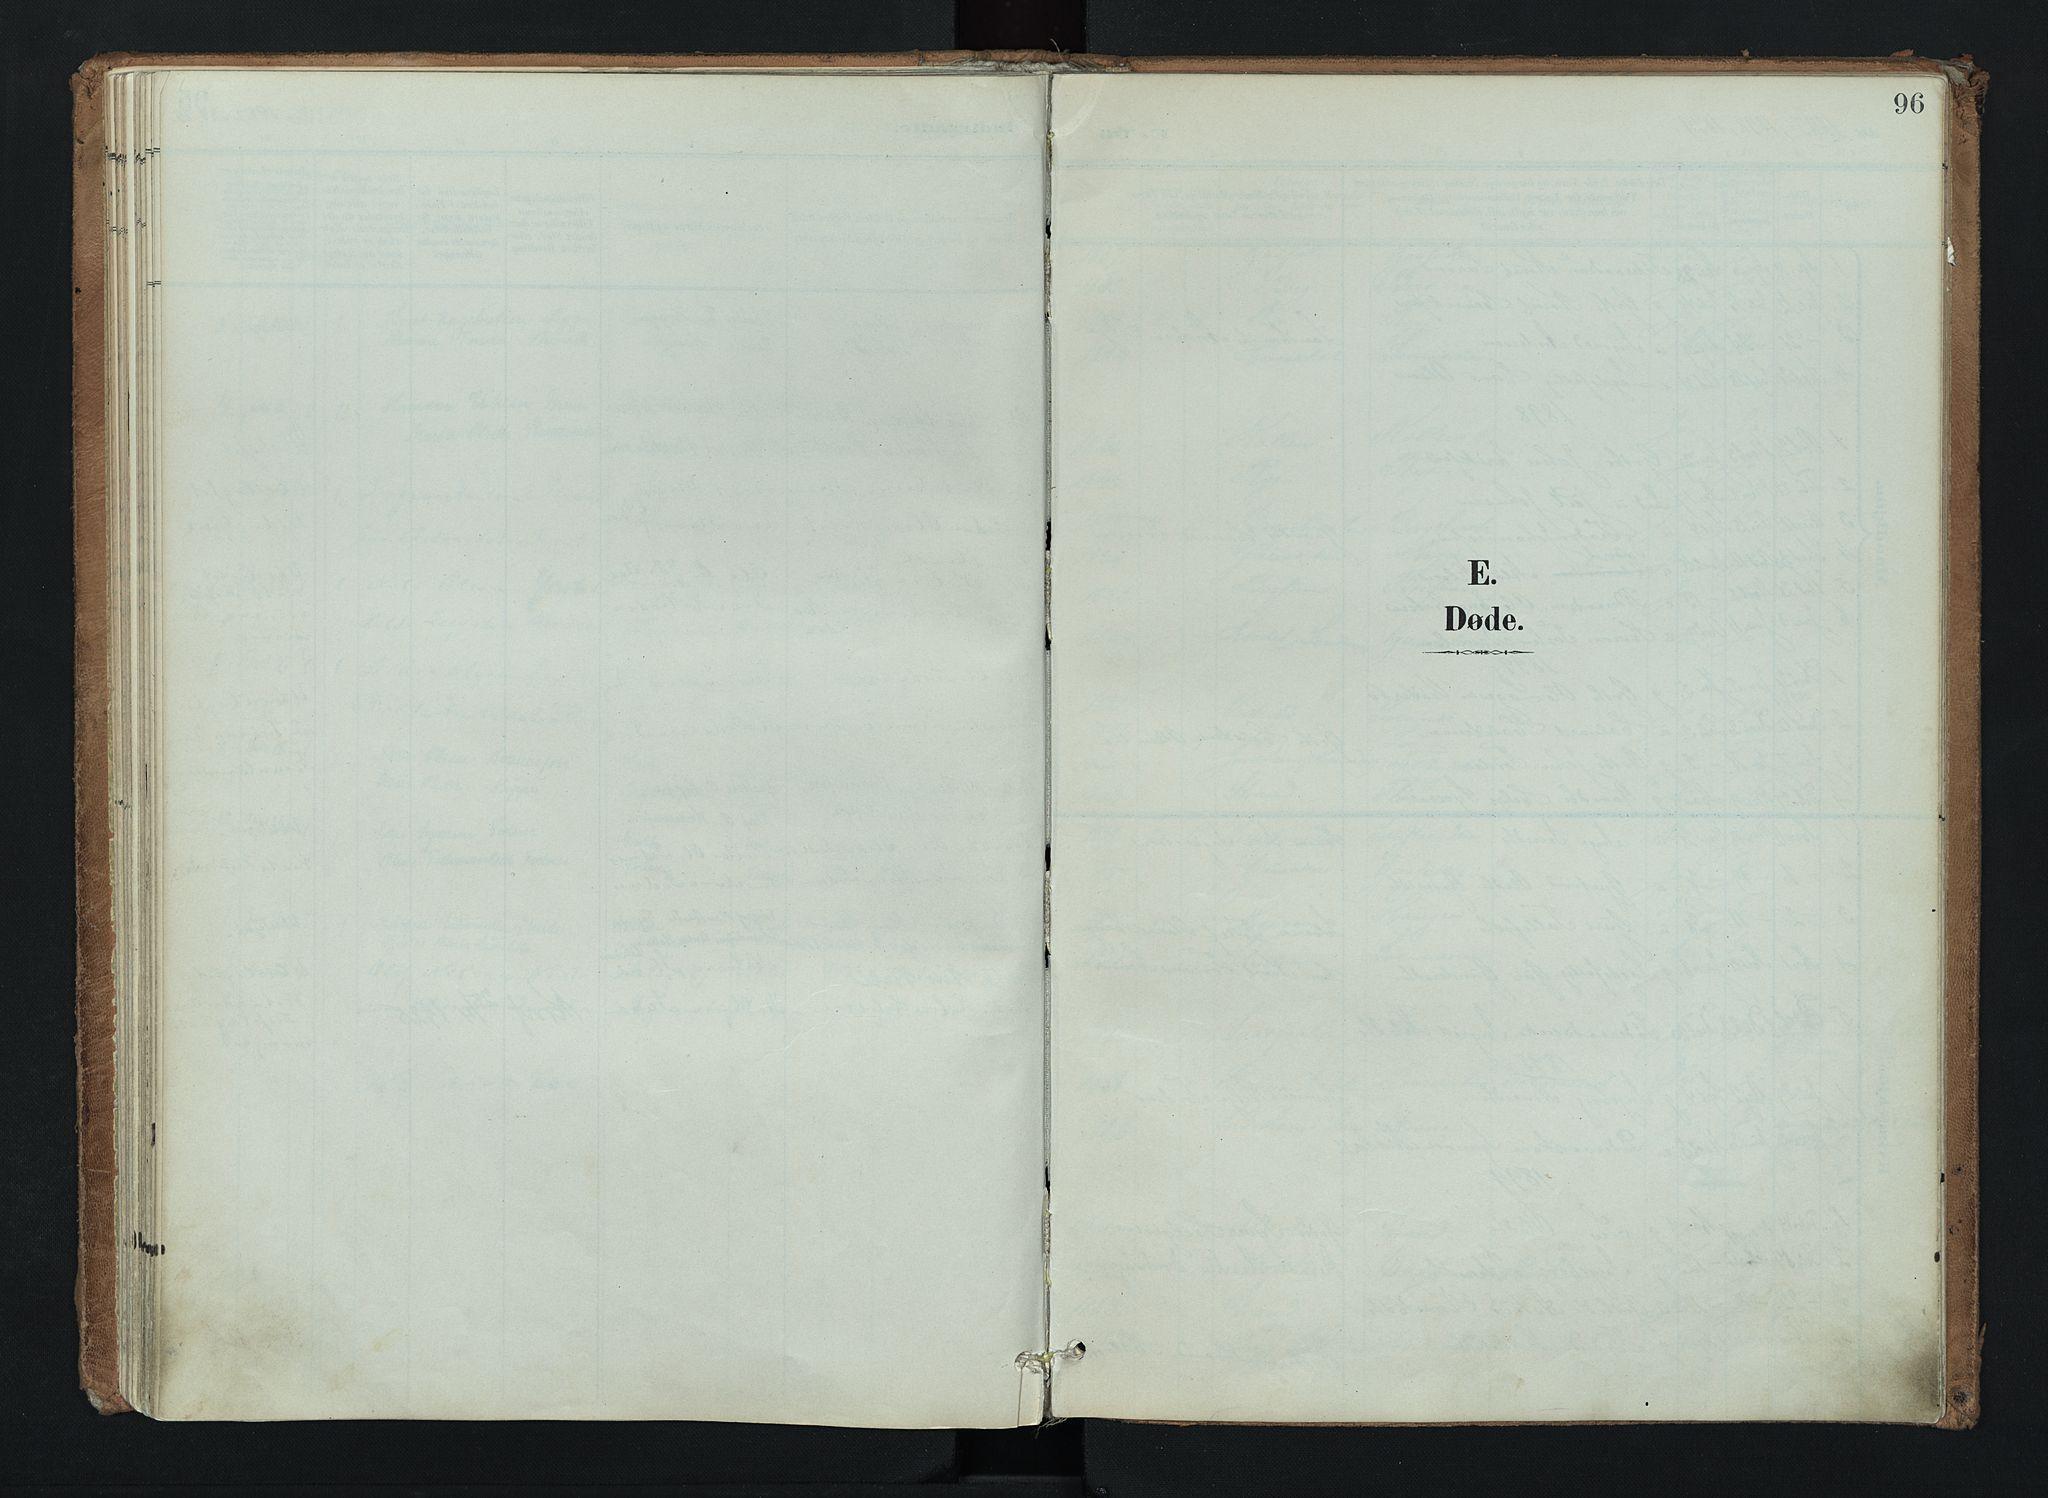 SAH, Nord-Aurdal prestekontor, Ministerialbok nr. 16, 1897-1925, s. 96